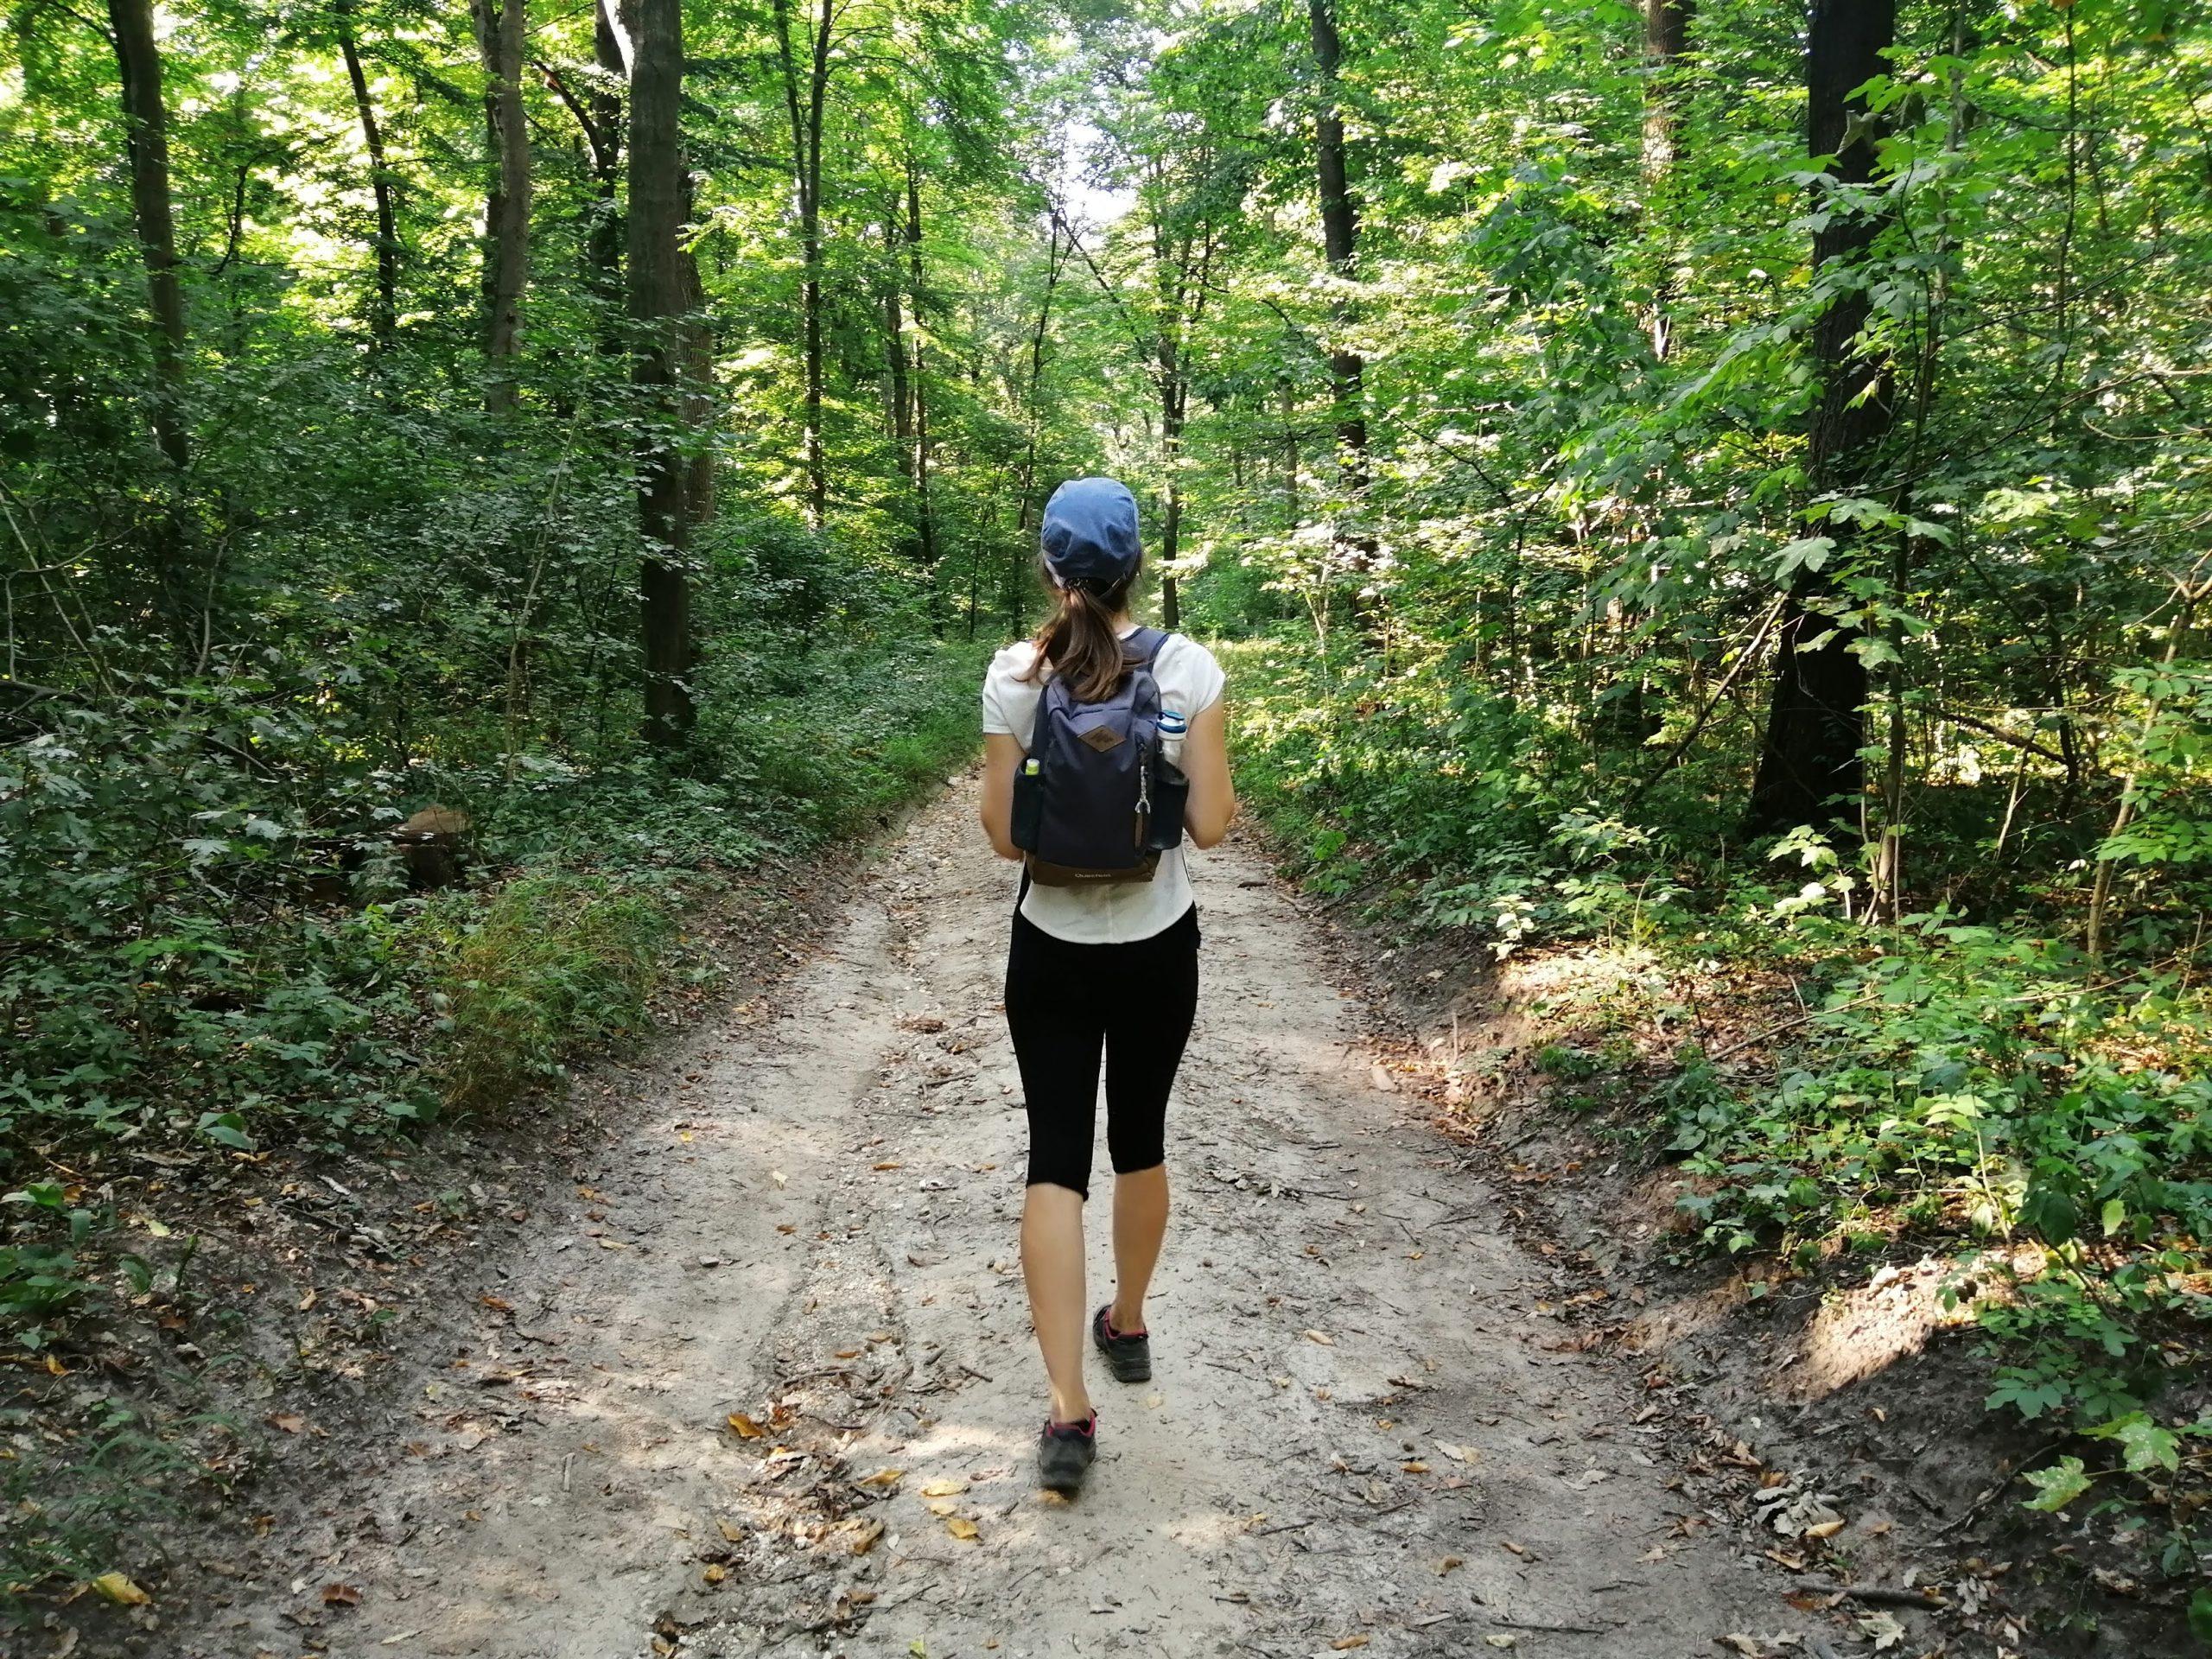 Trekking along the trail